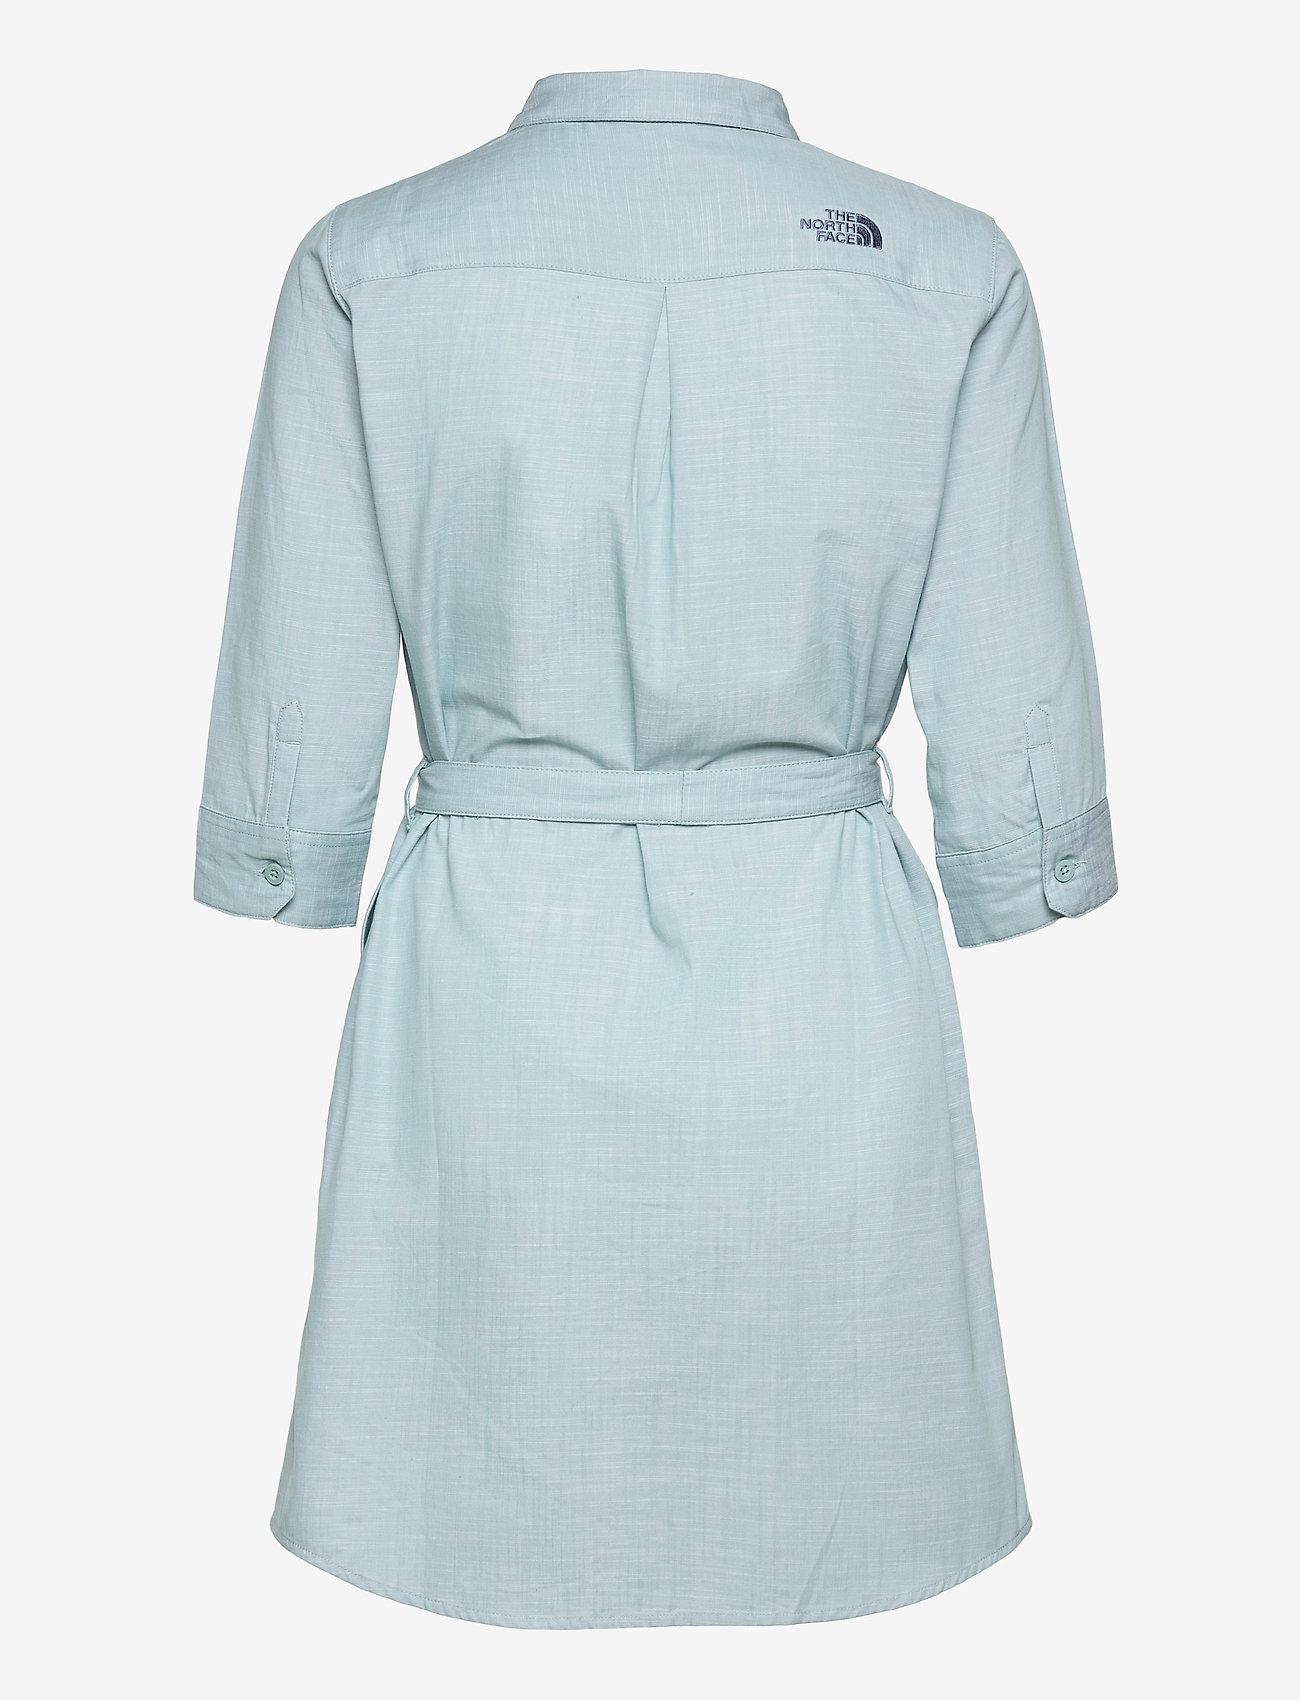 The North Face - W BERNINA DRESS - sommerkjoler - tourmaline blue chambray - 1